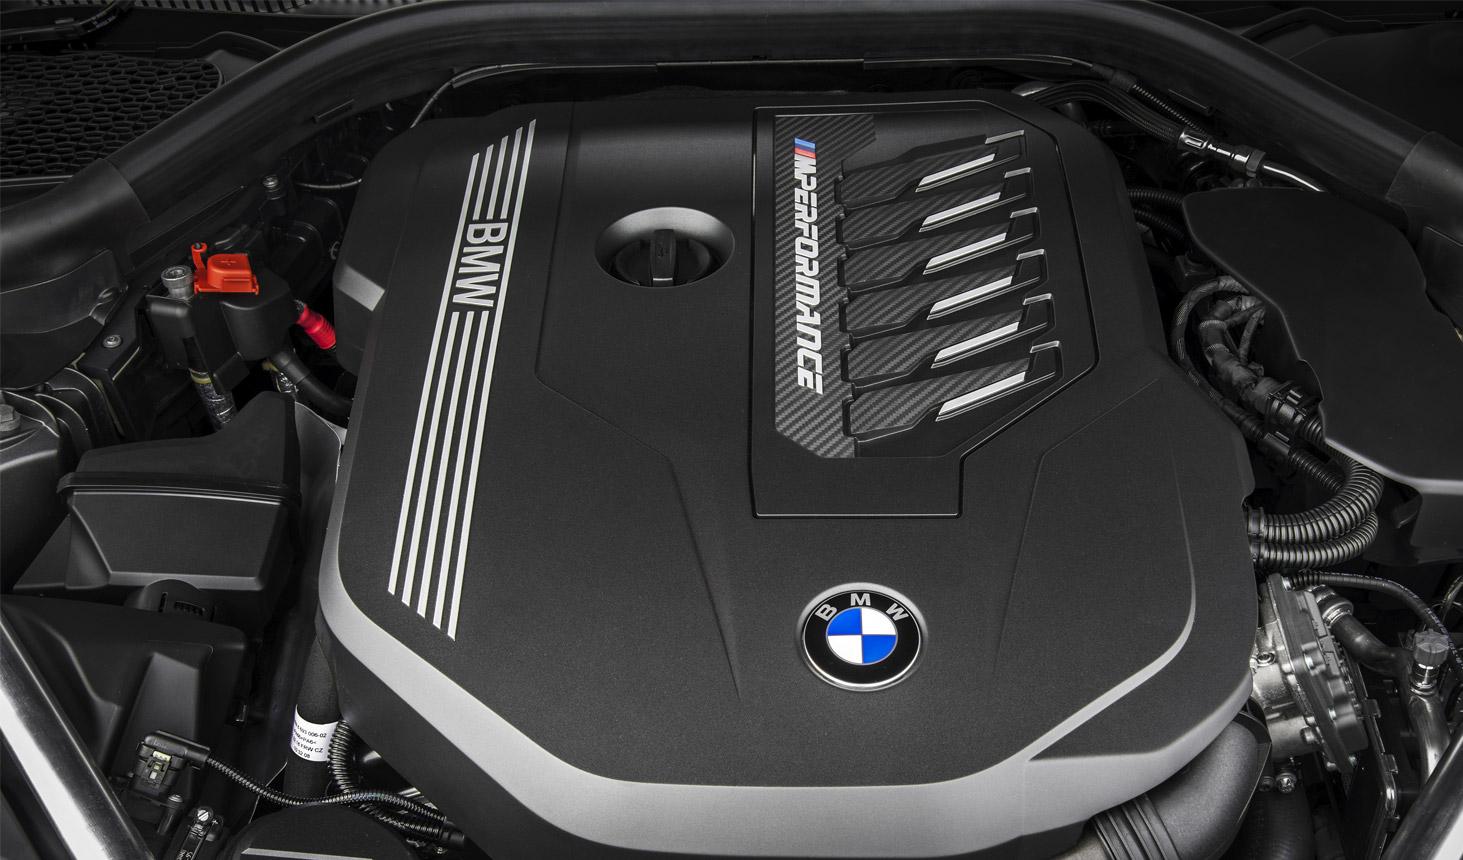 5-fiche-occasion-BMW-Z4-G29-fiabilite-guide-achat.jpg